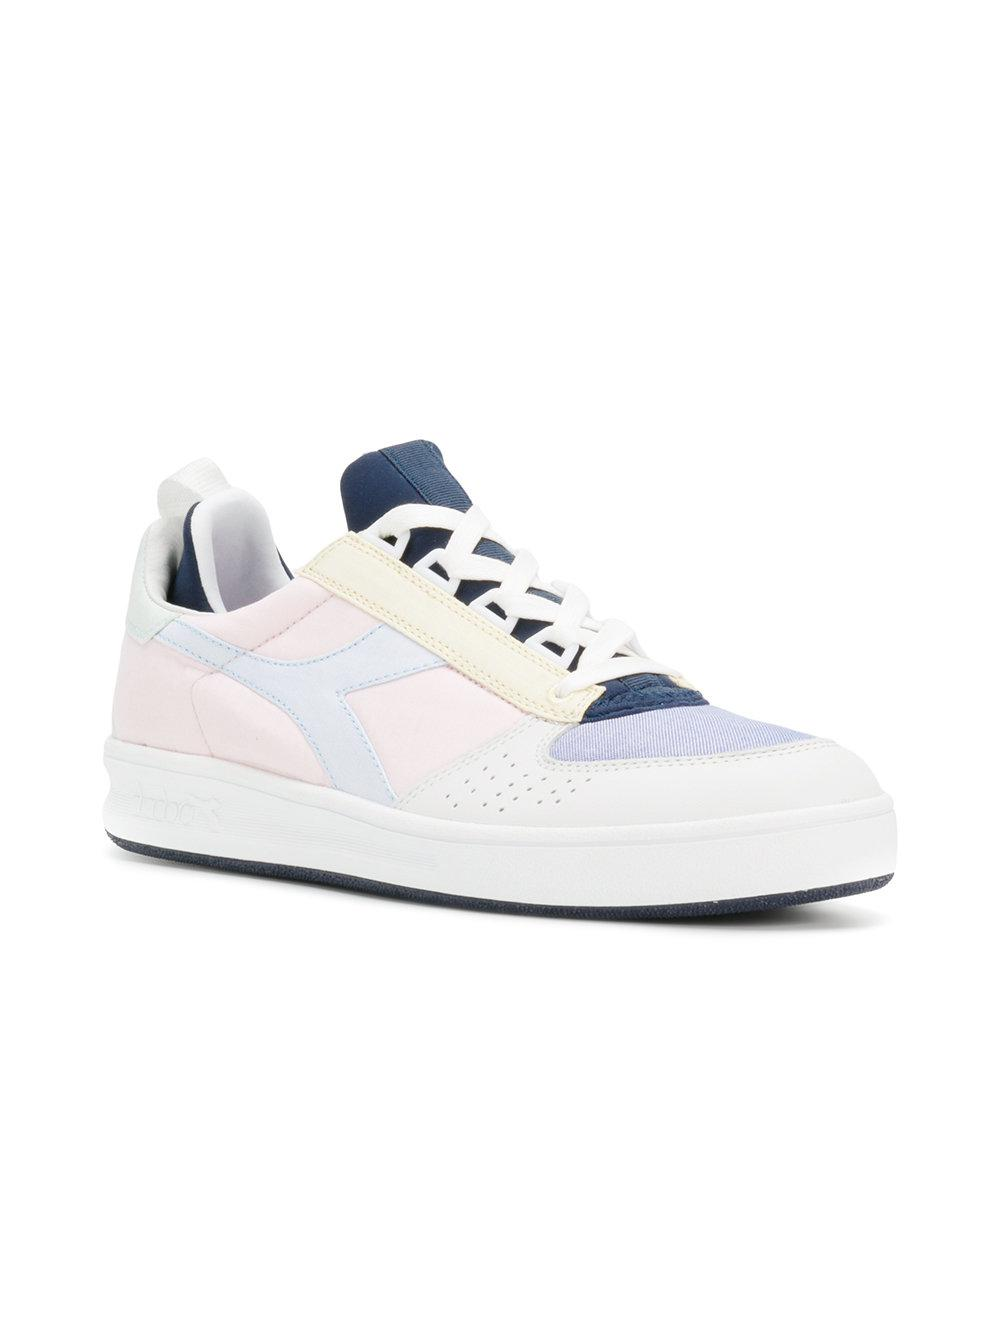 Chaussures - Bas-tops Et Baskets Diadora pTDHuIdZ9v